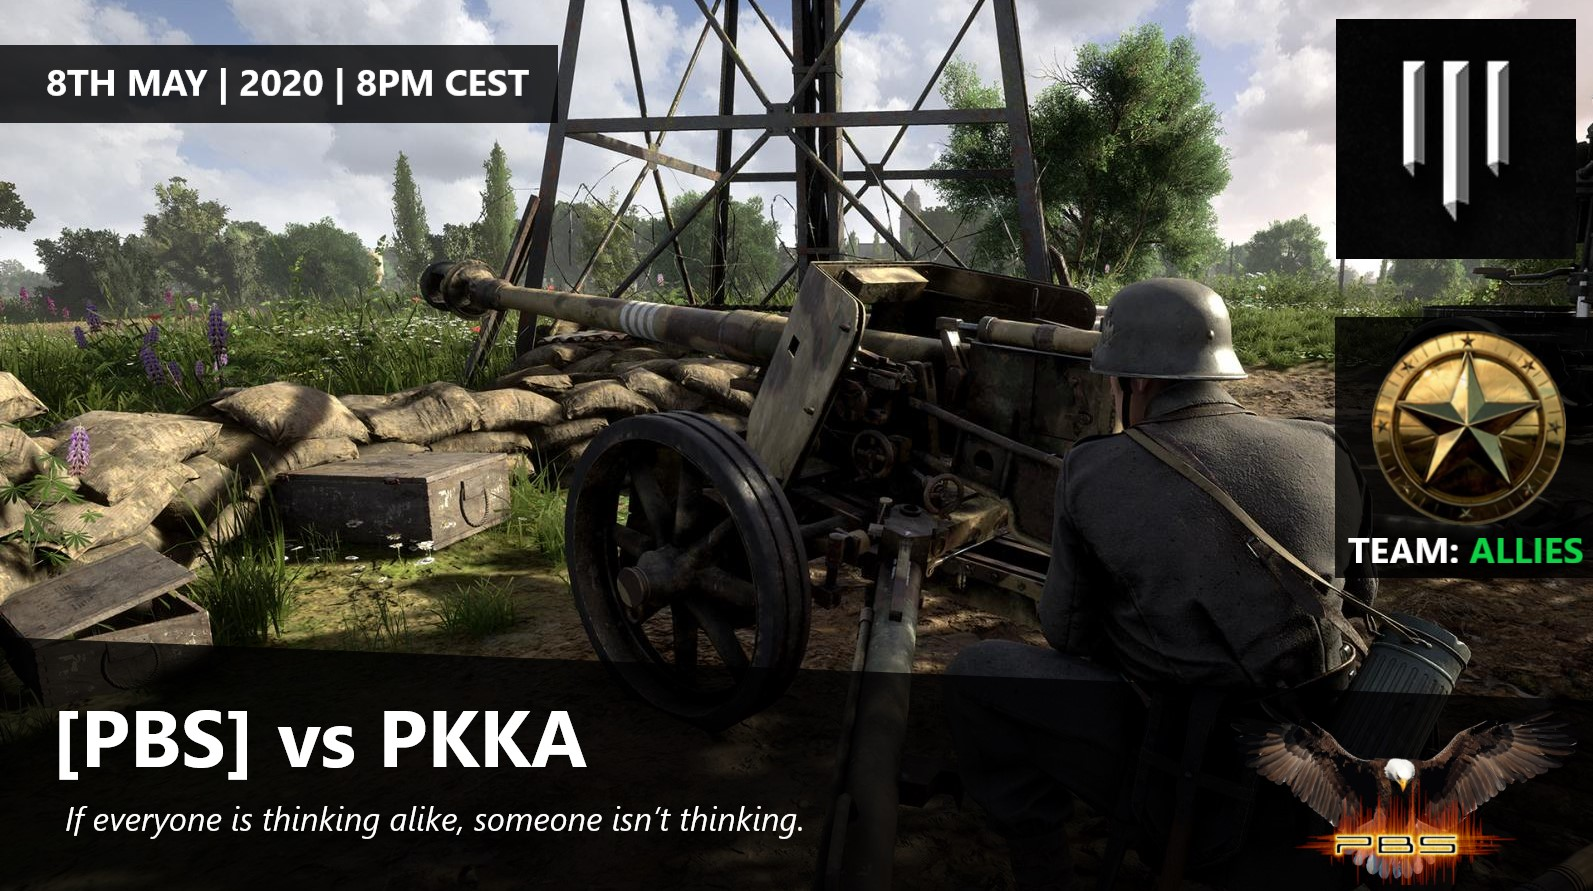 PBS vs PKAA